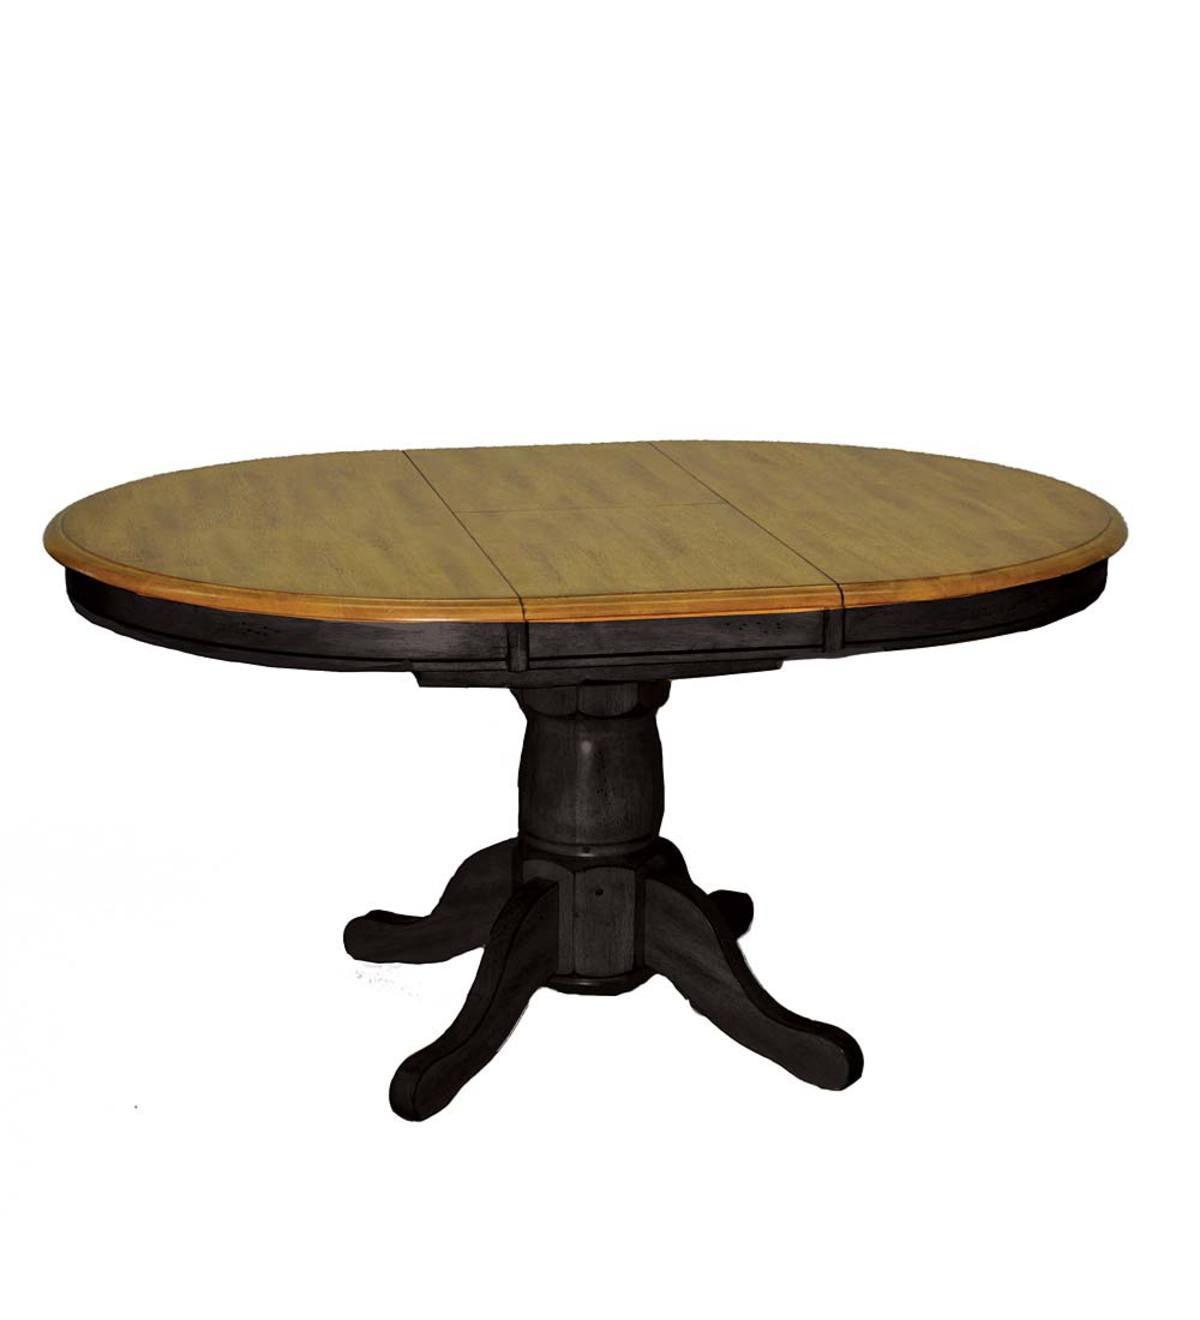 Yorkshire Rustic Oak Pedestal Dining Table Black